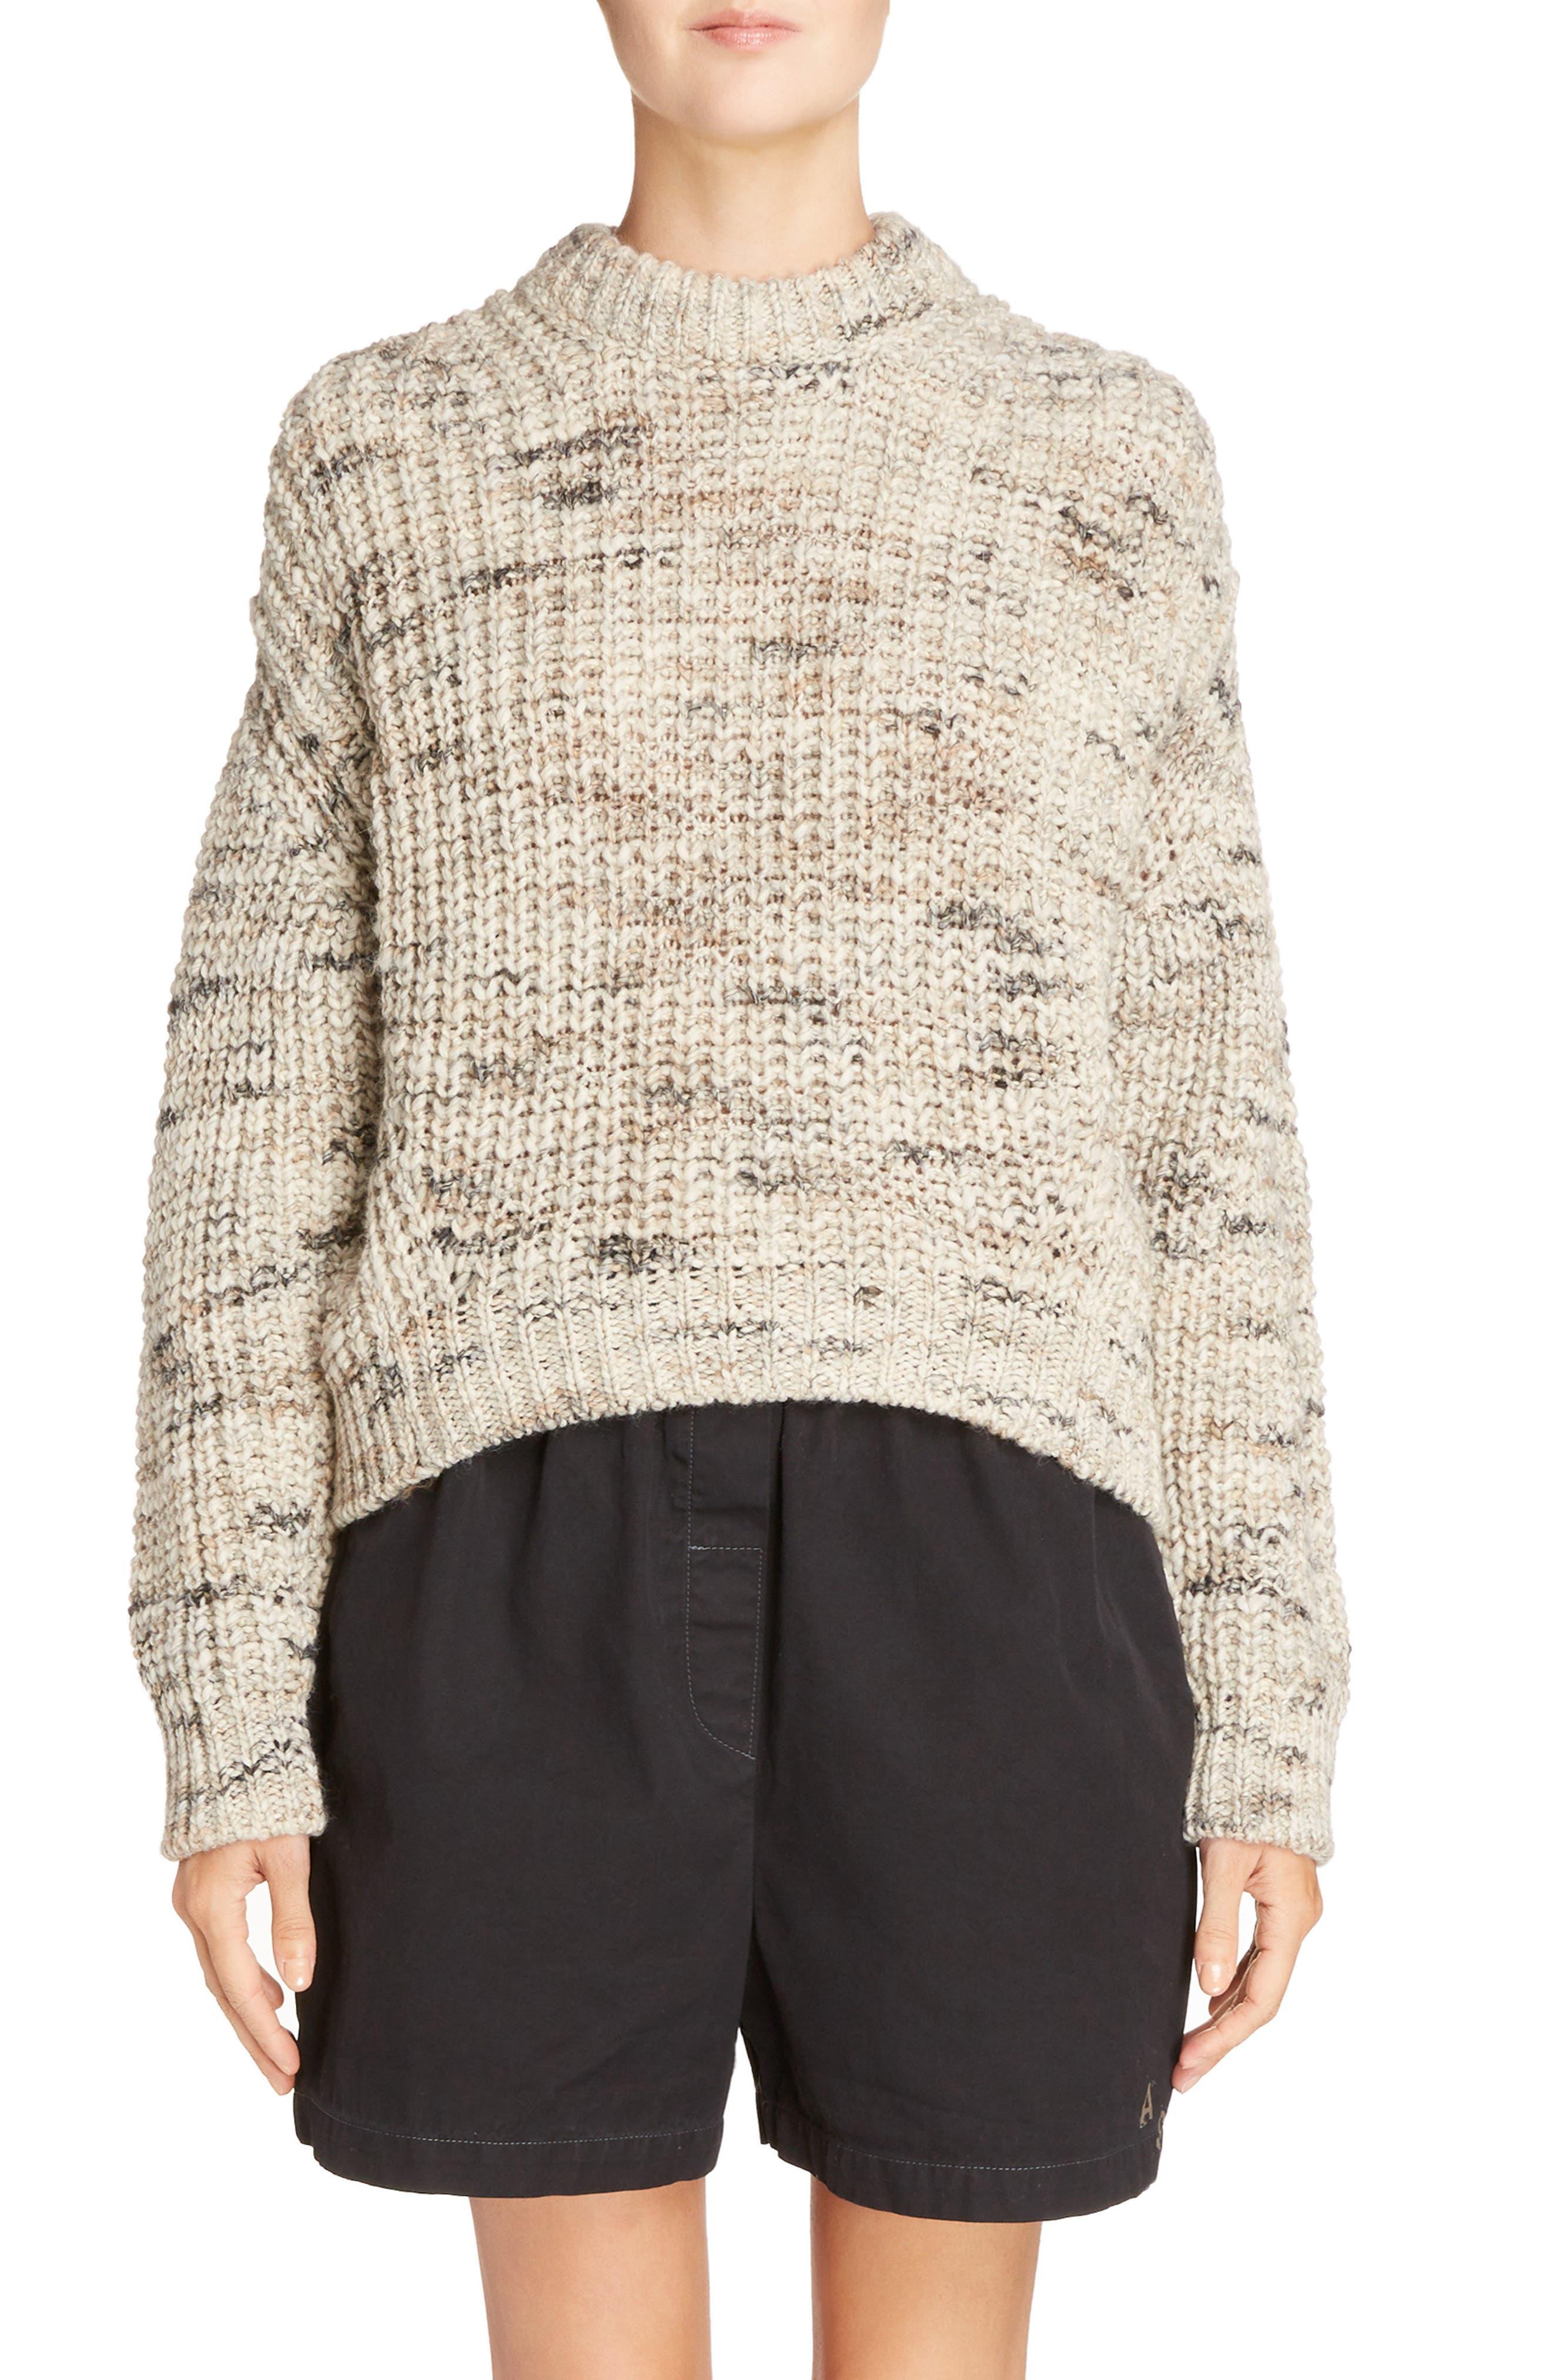 Zora Multi Sweater,                             Main thumbnail 1, color,                             White Mix